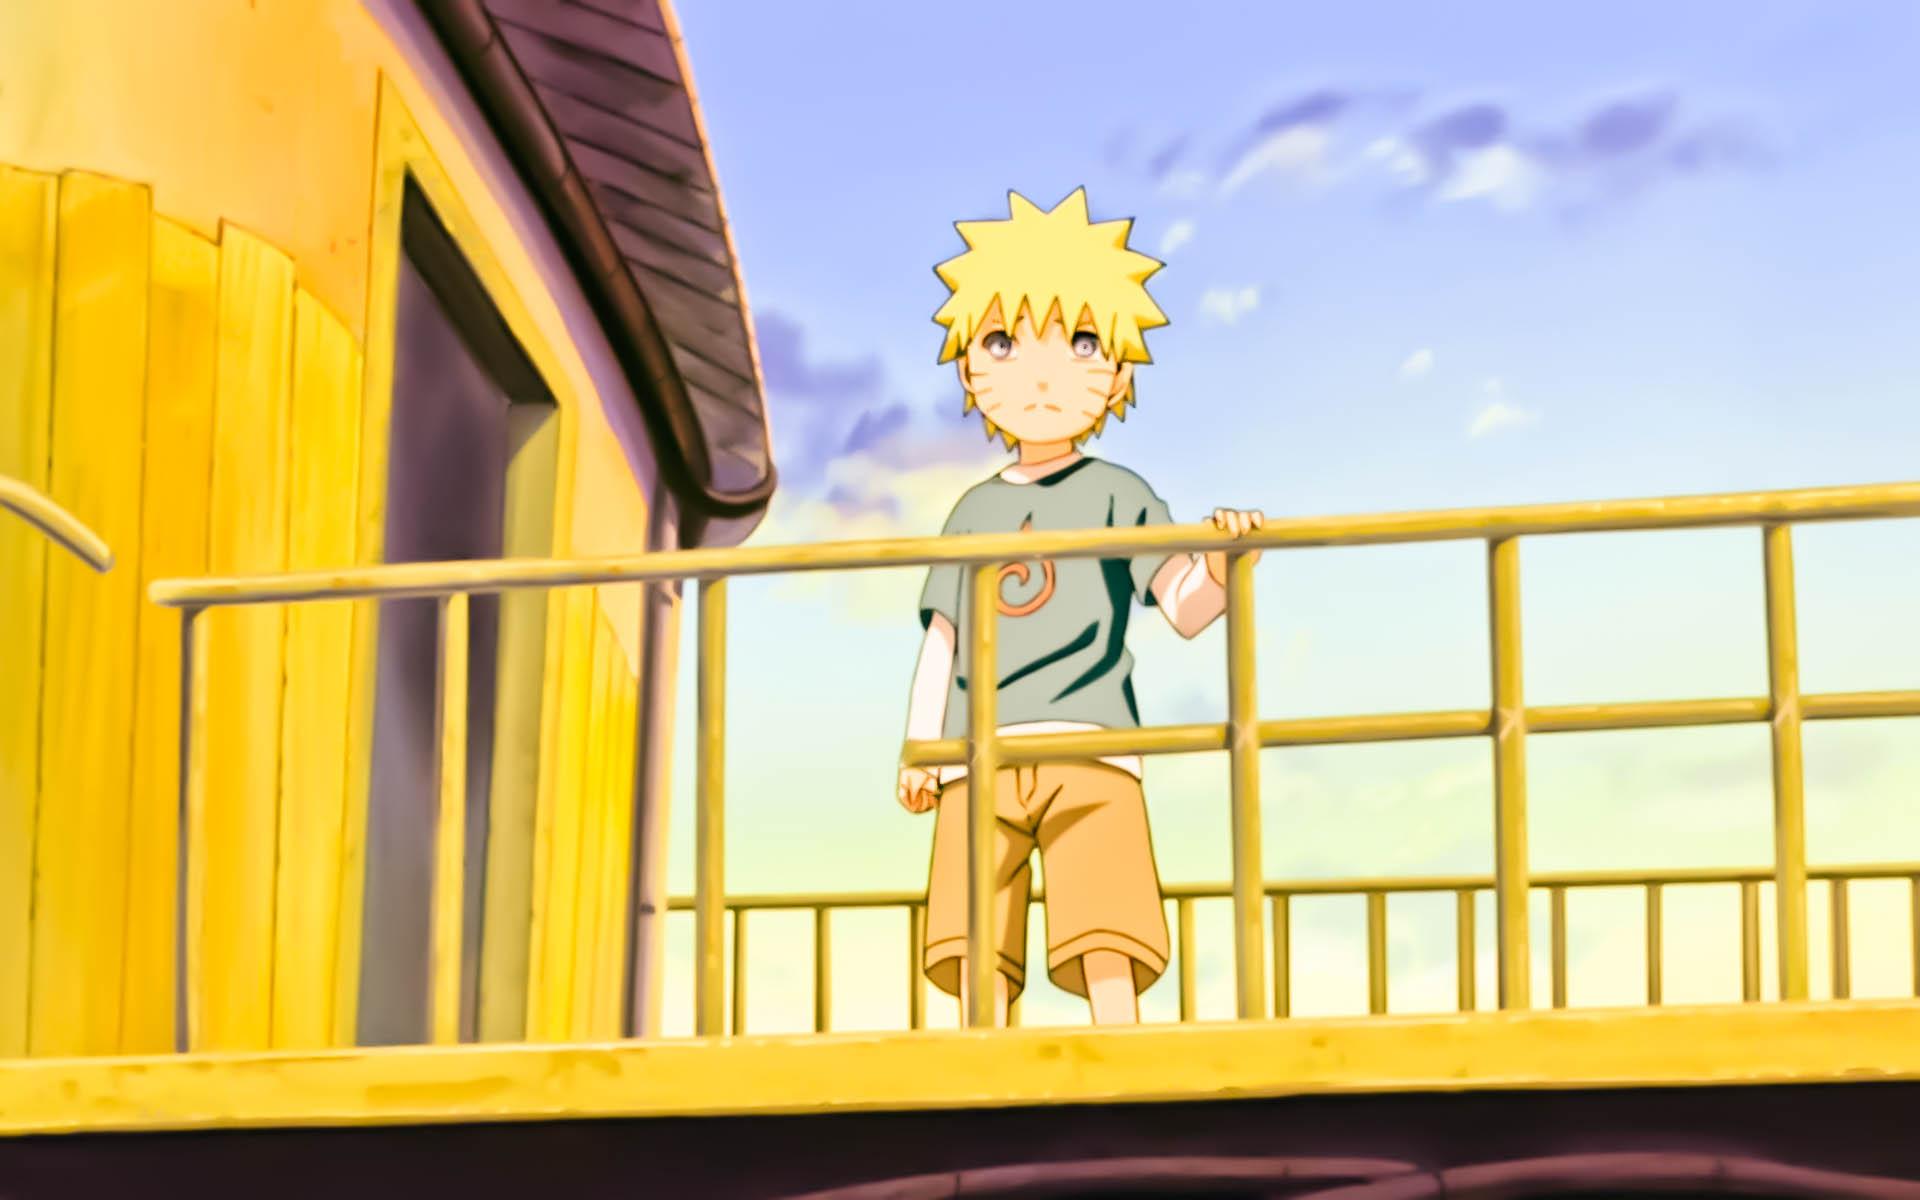 Naruto Kid on a Bridge Widescreen Wallpaper by psy5510Little Kid Naruto